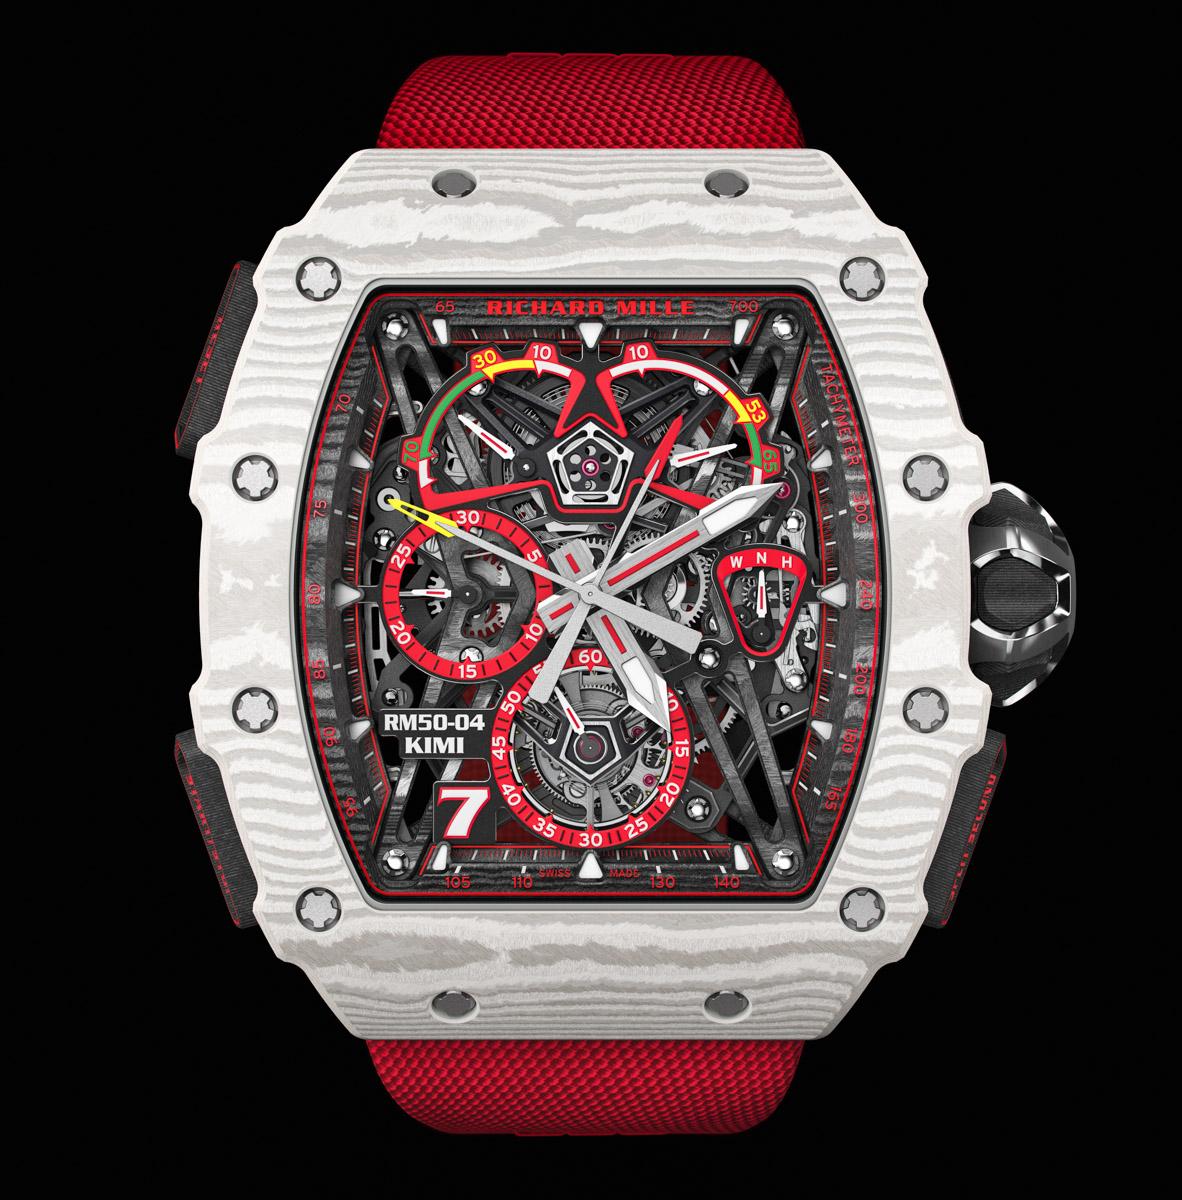 Richard Mille RM 50-04 Tourbillon Split-Seconds Chronograph Kimi Raikkonen